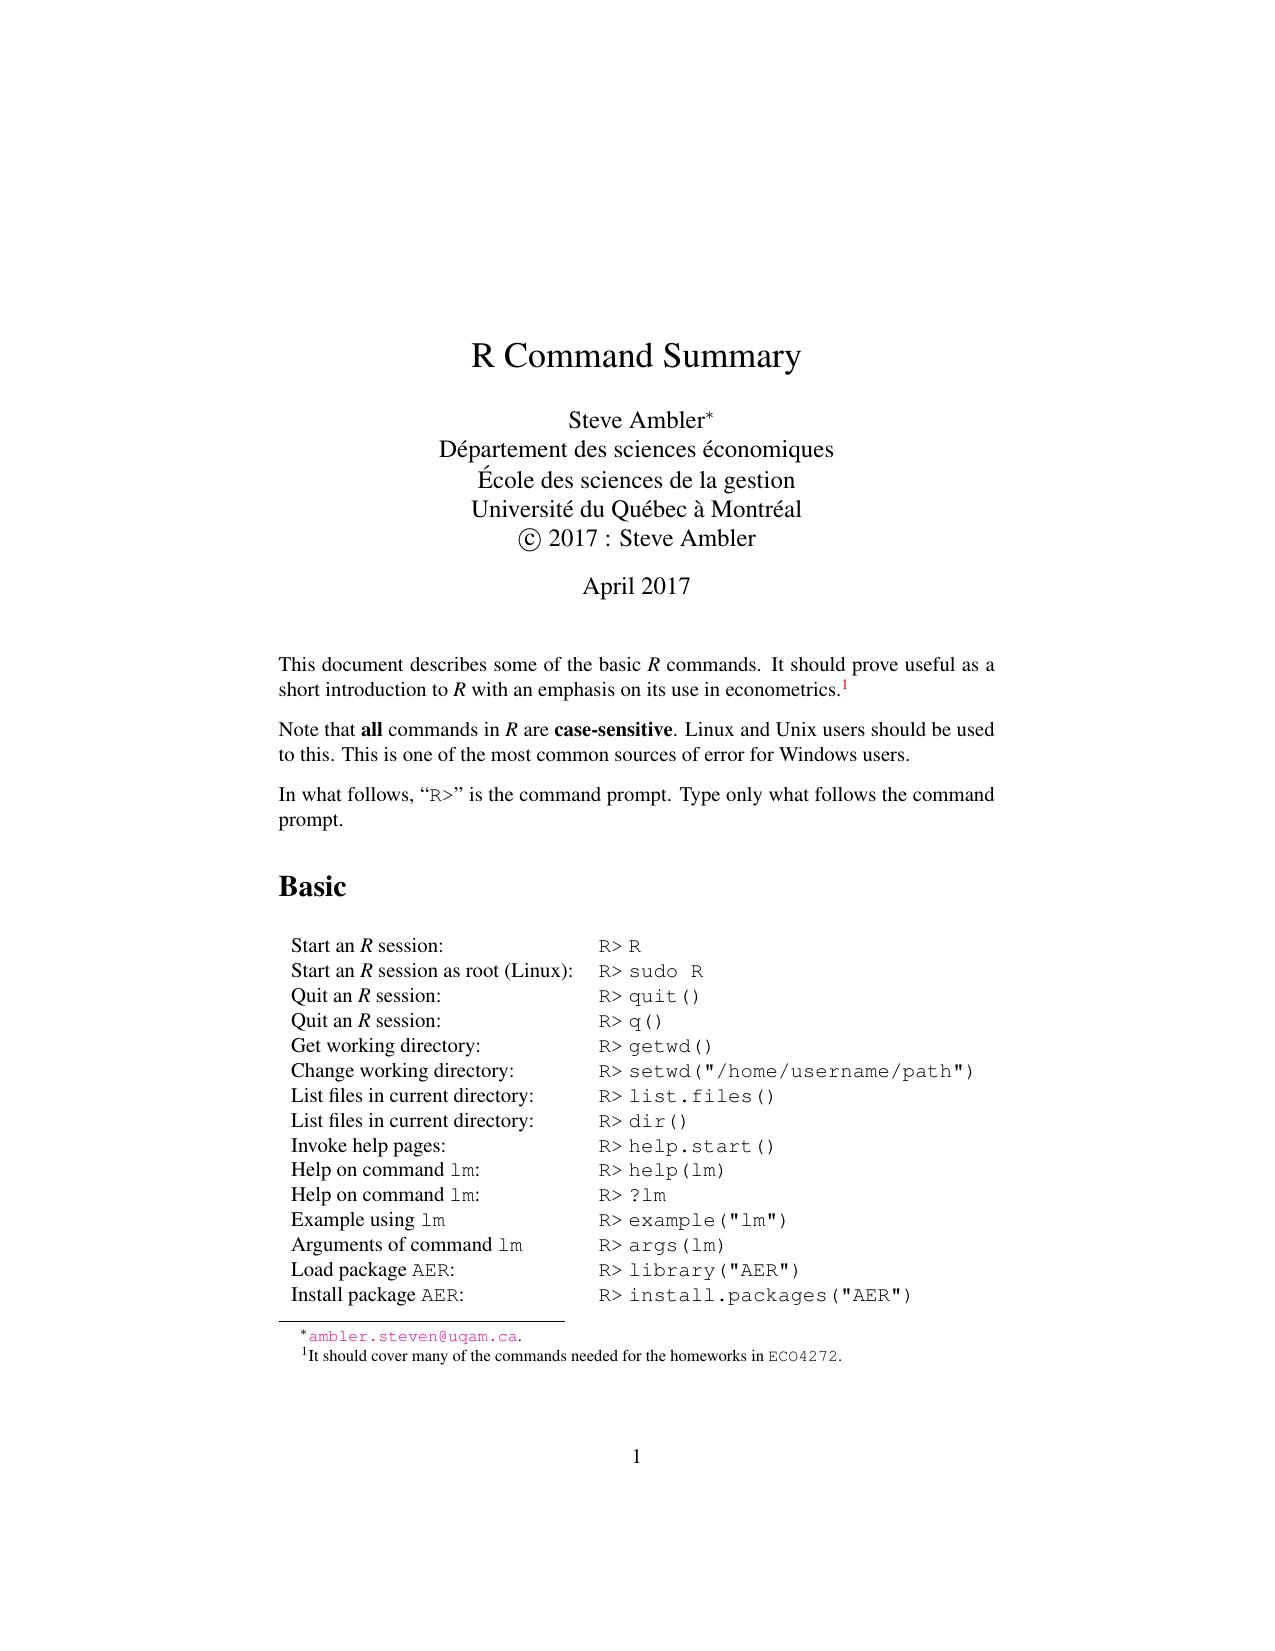 R Command Summary - Steve Ambler